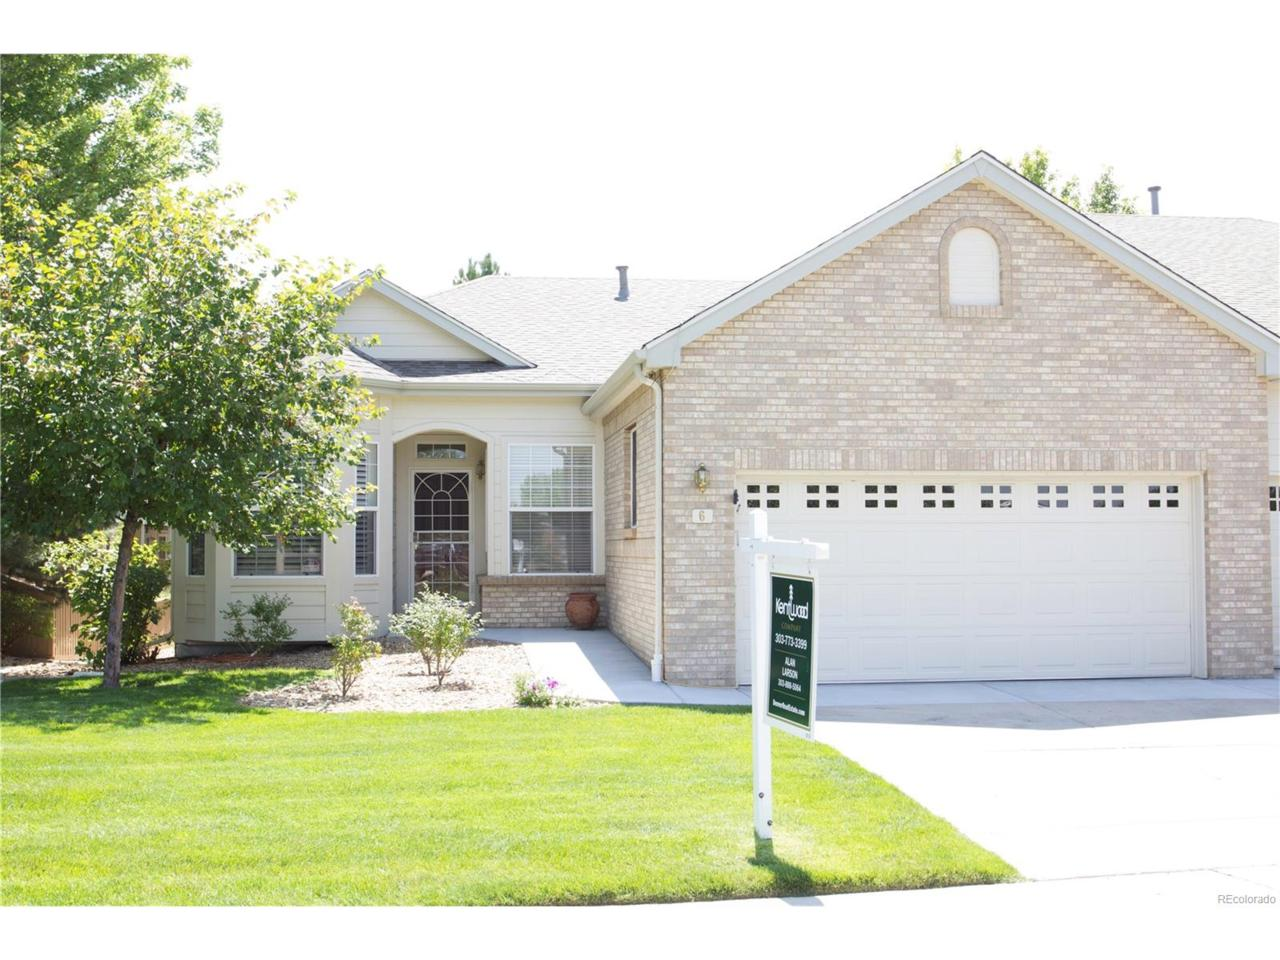 6 Woodland Circle, Highlands Ranch, CO 80126 (MLS #9793138) :: 8z Real Estate